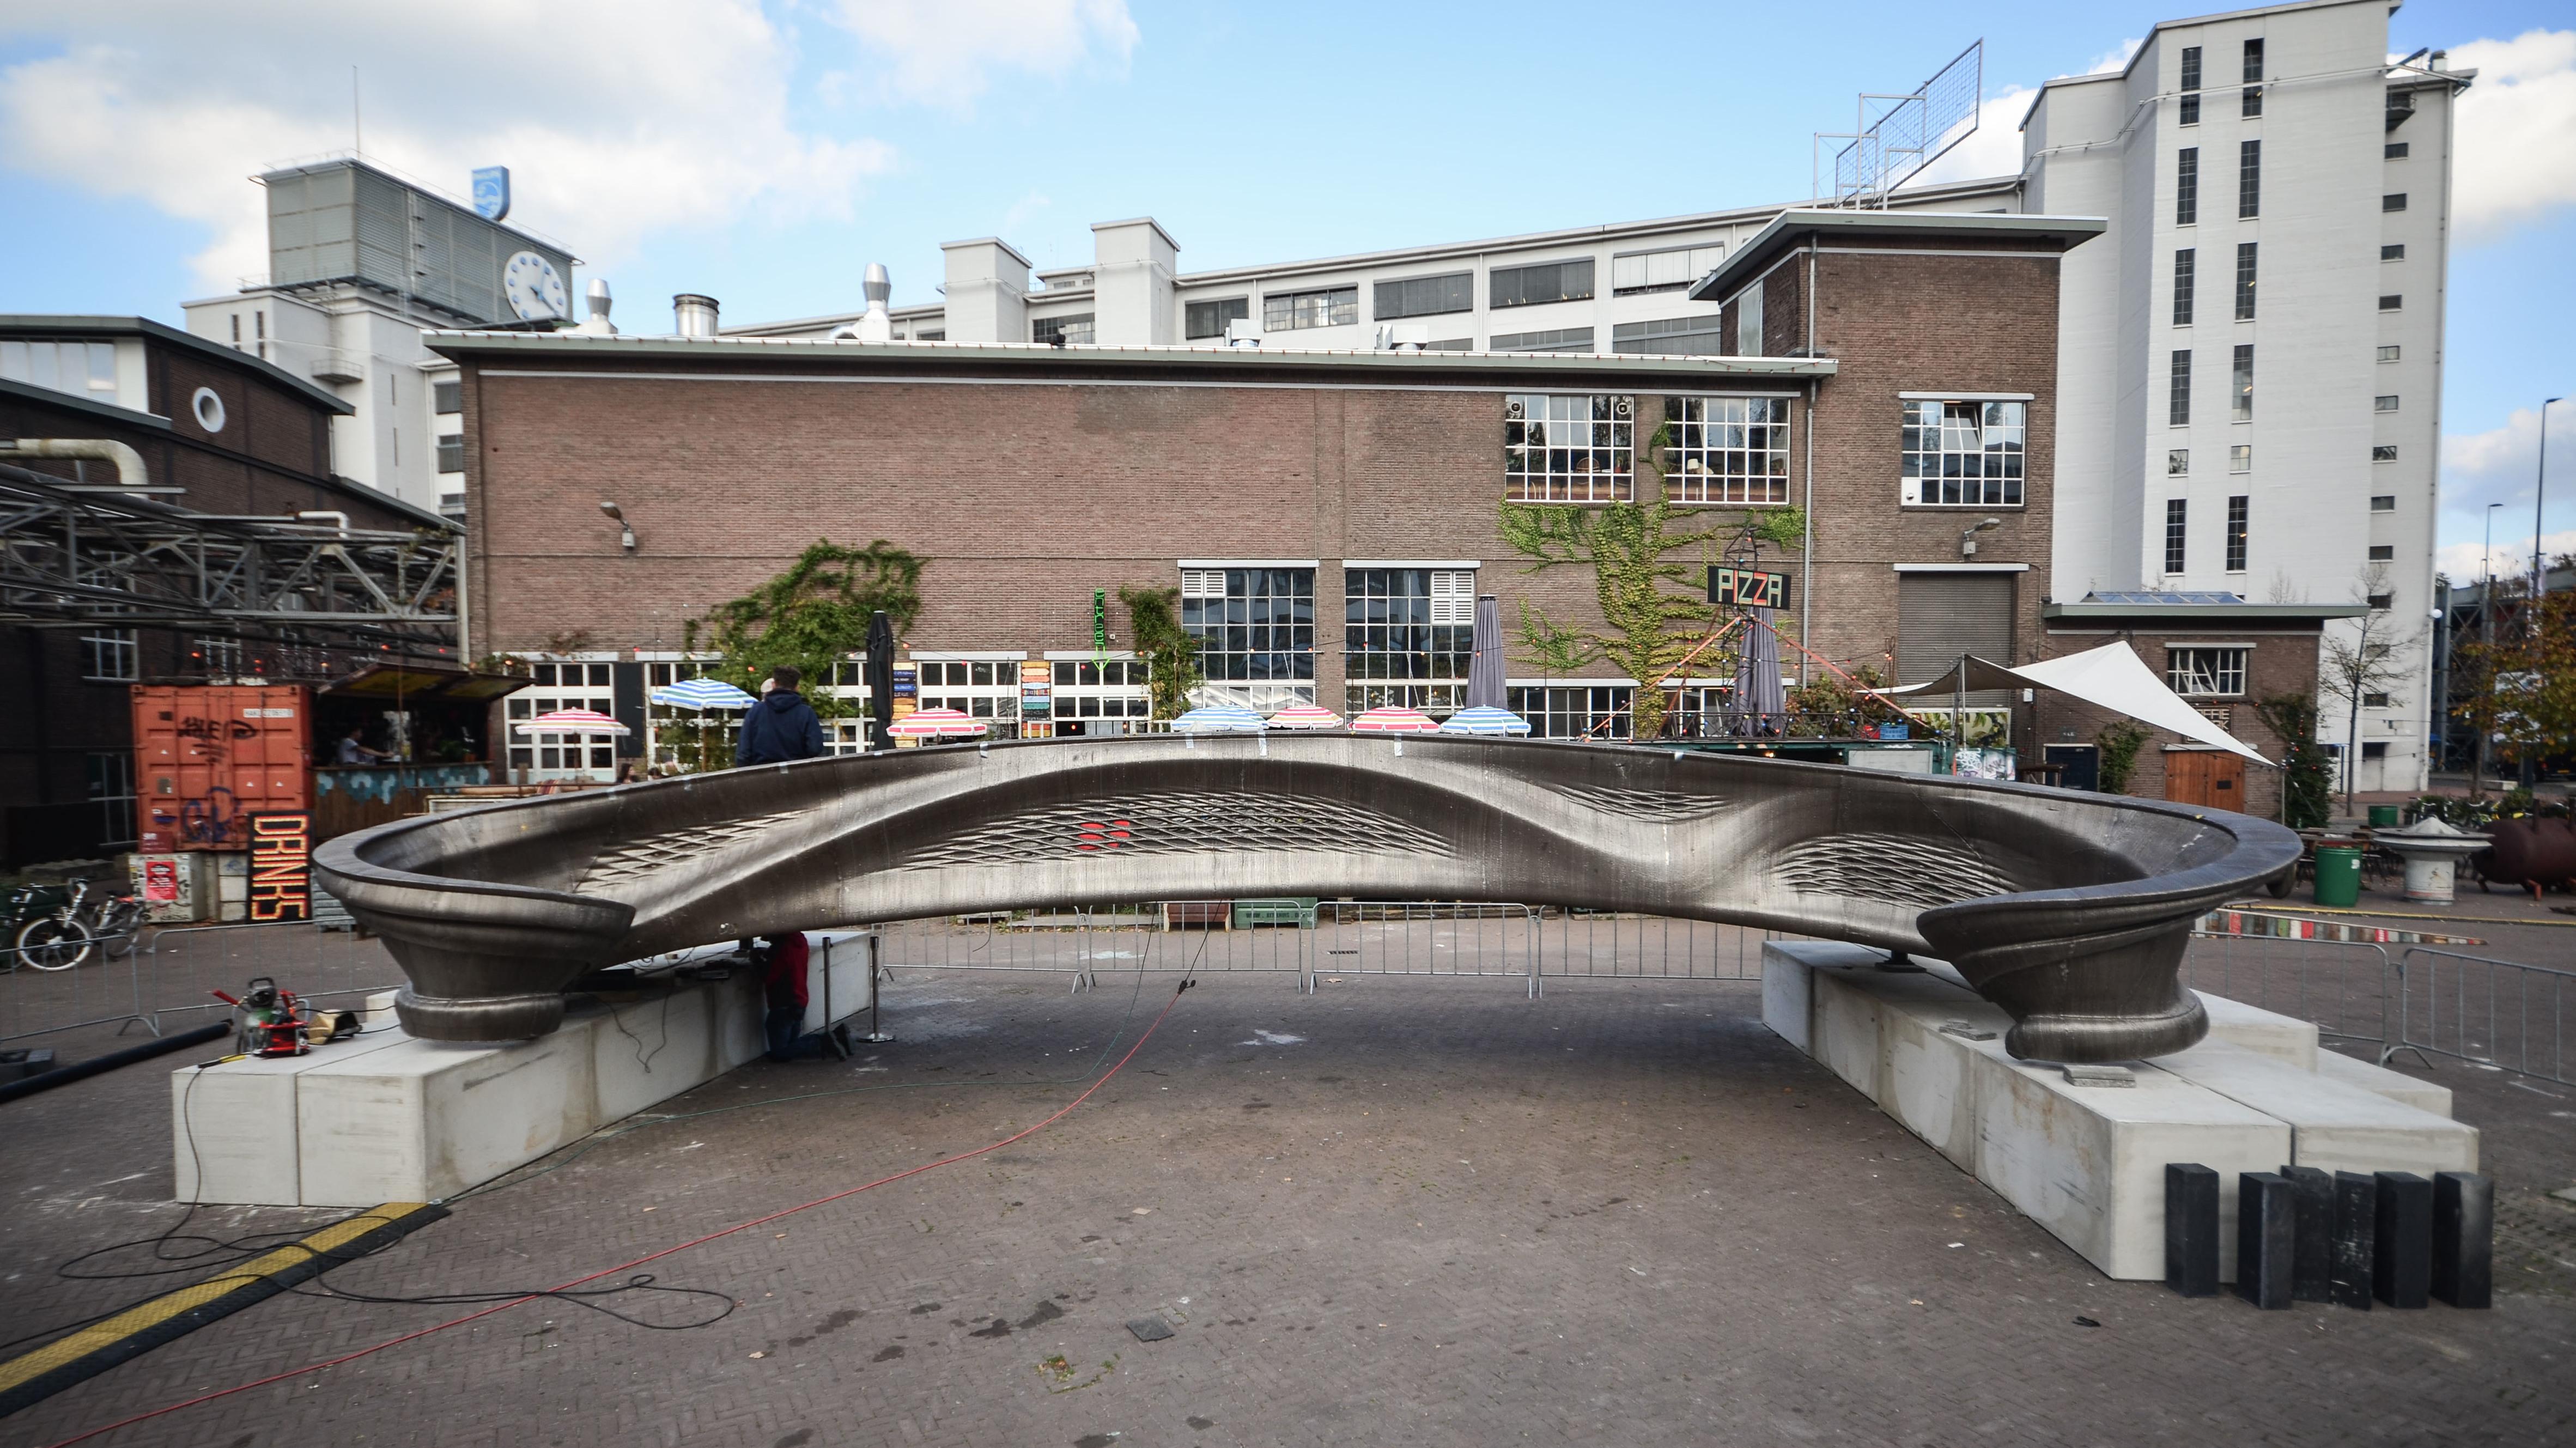 Ansicht der kompletten Brücke